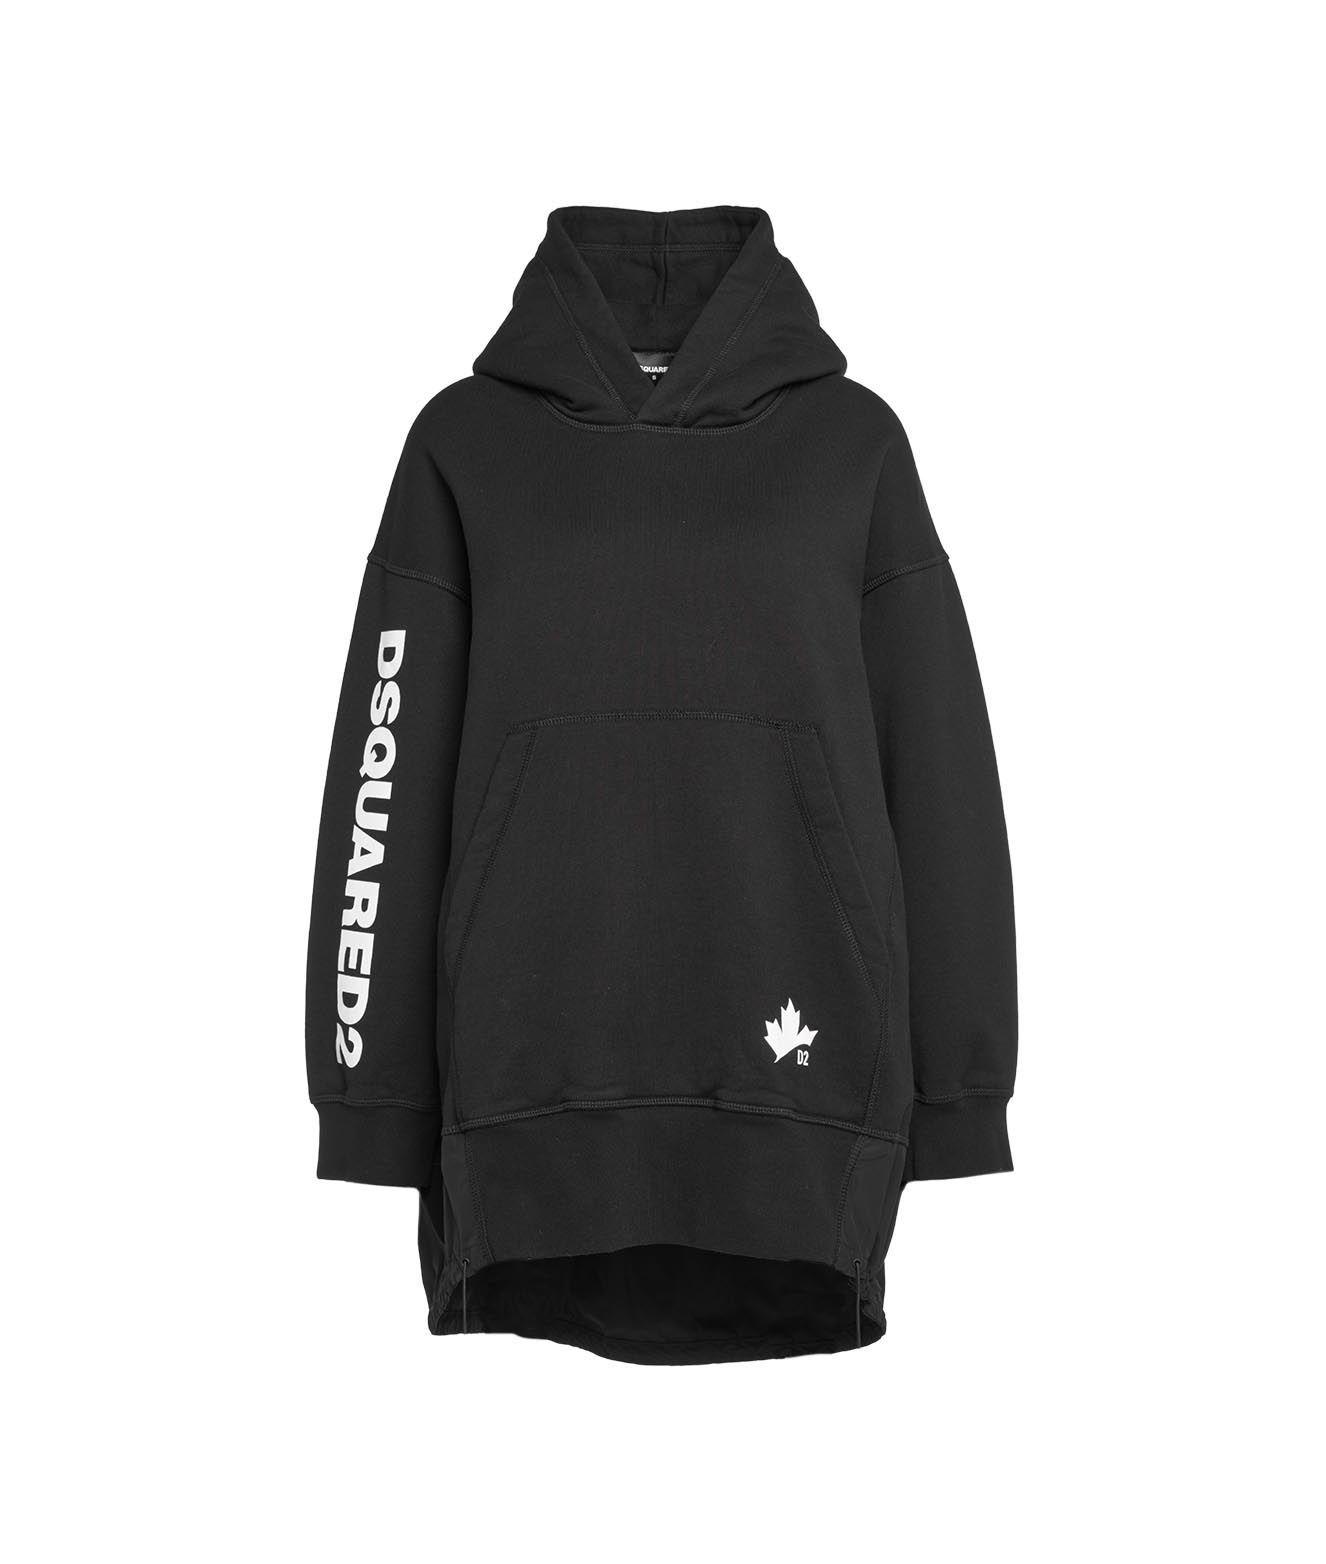 Dsquared2 Sweatshirts DSQUARED2 WOMEN'S BLACK OTHER MATERIALS SWEATSHIRT